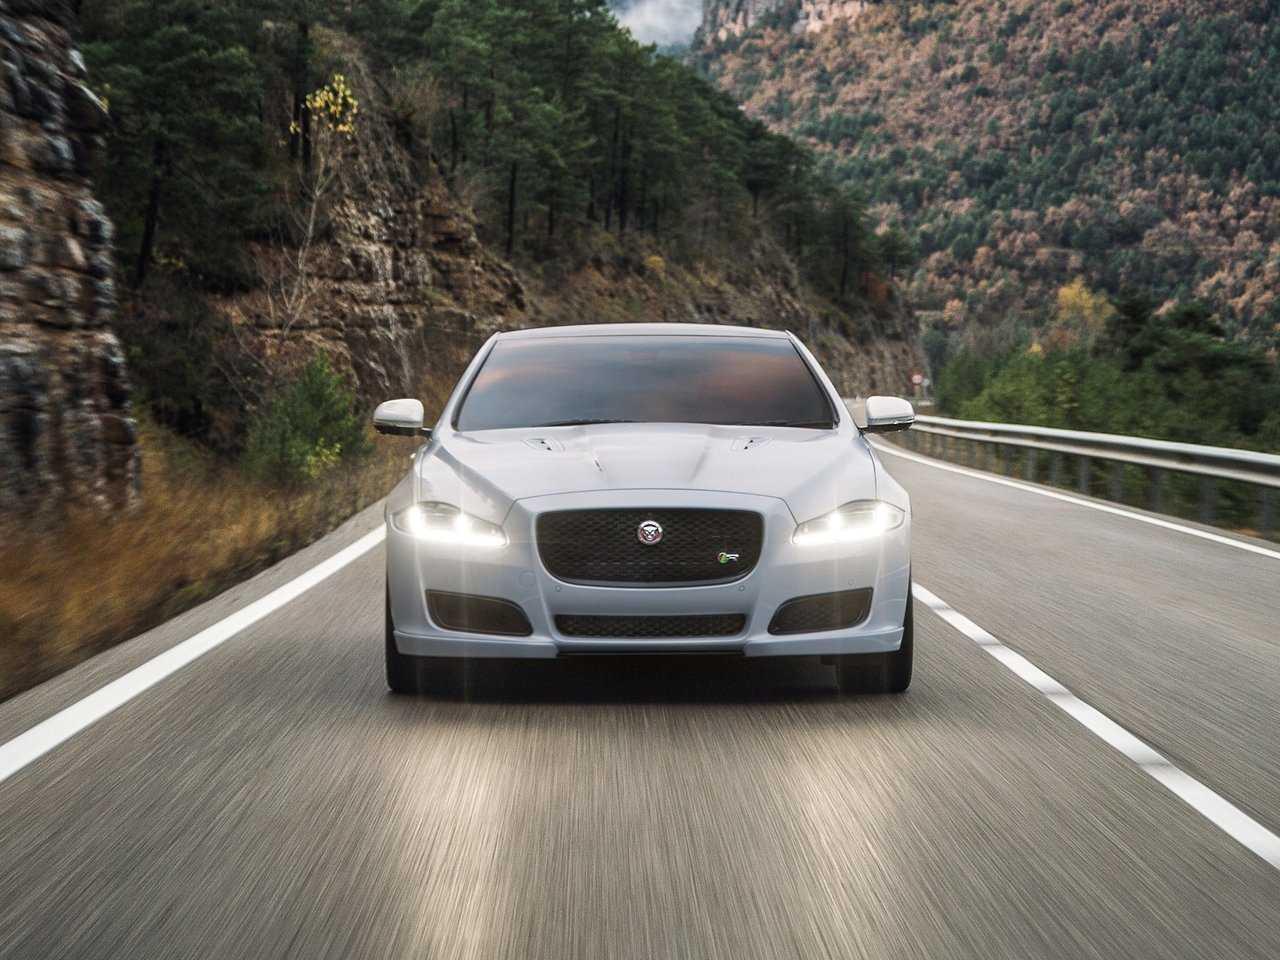 Jaguar xj 3.0 s/c awd at portfolio swb (02.2016 - н.в.) - технические характеристики